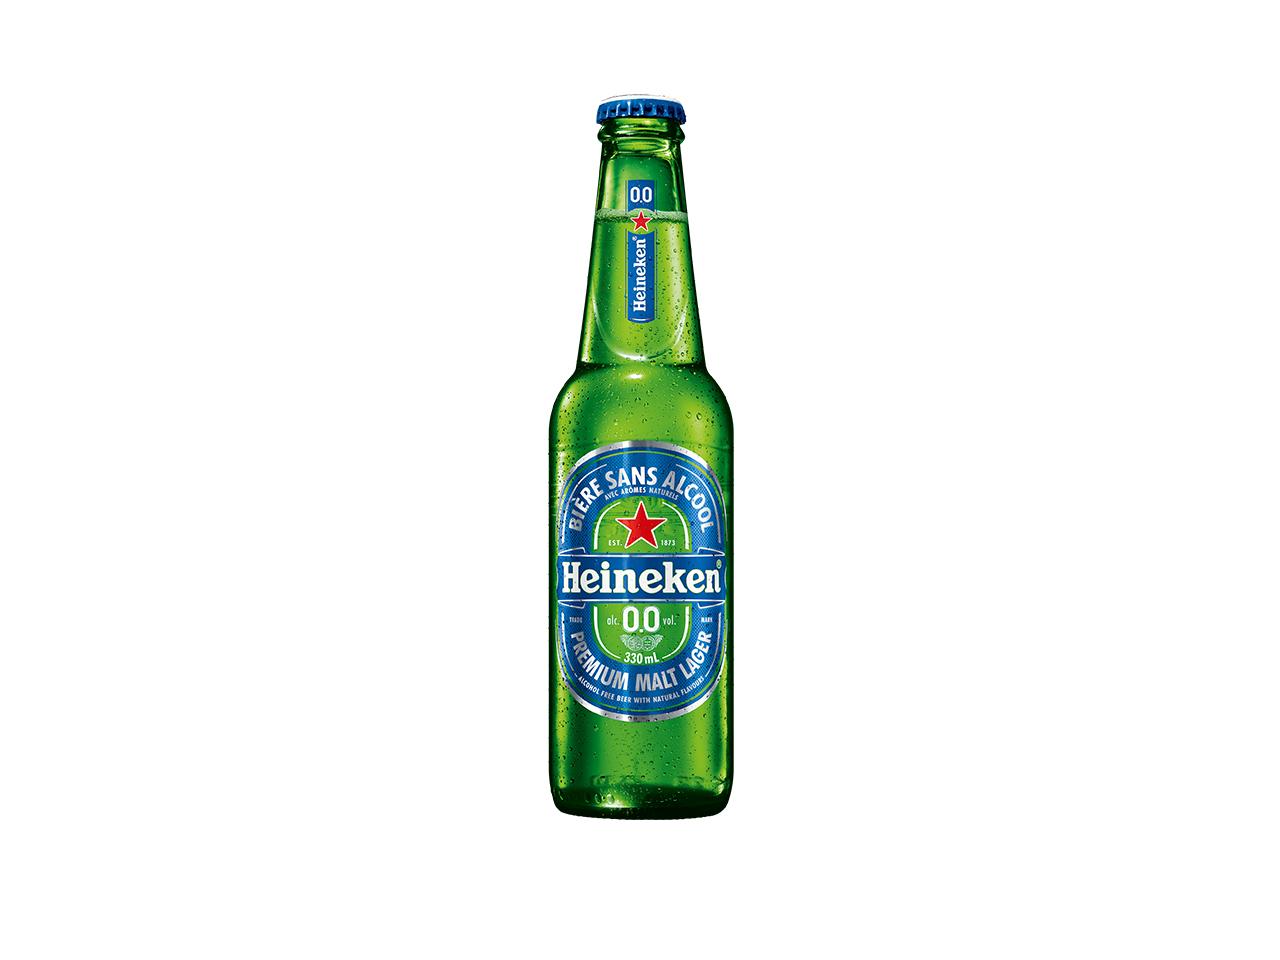 Botella de cerveza sin alcohol Heineken 0.0